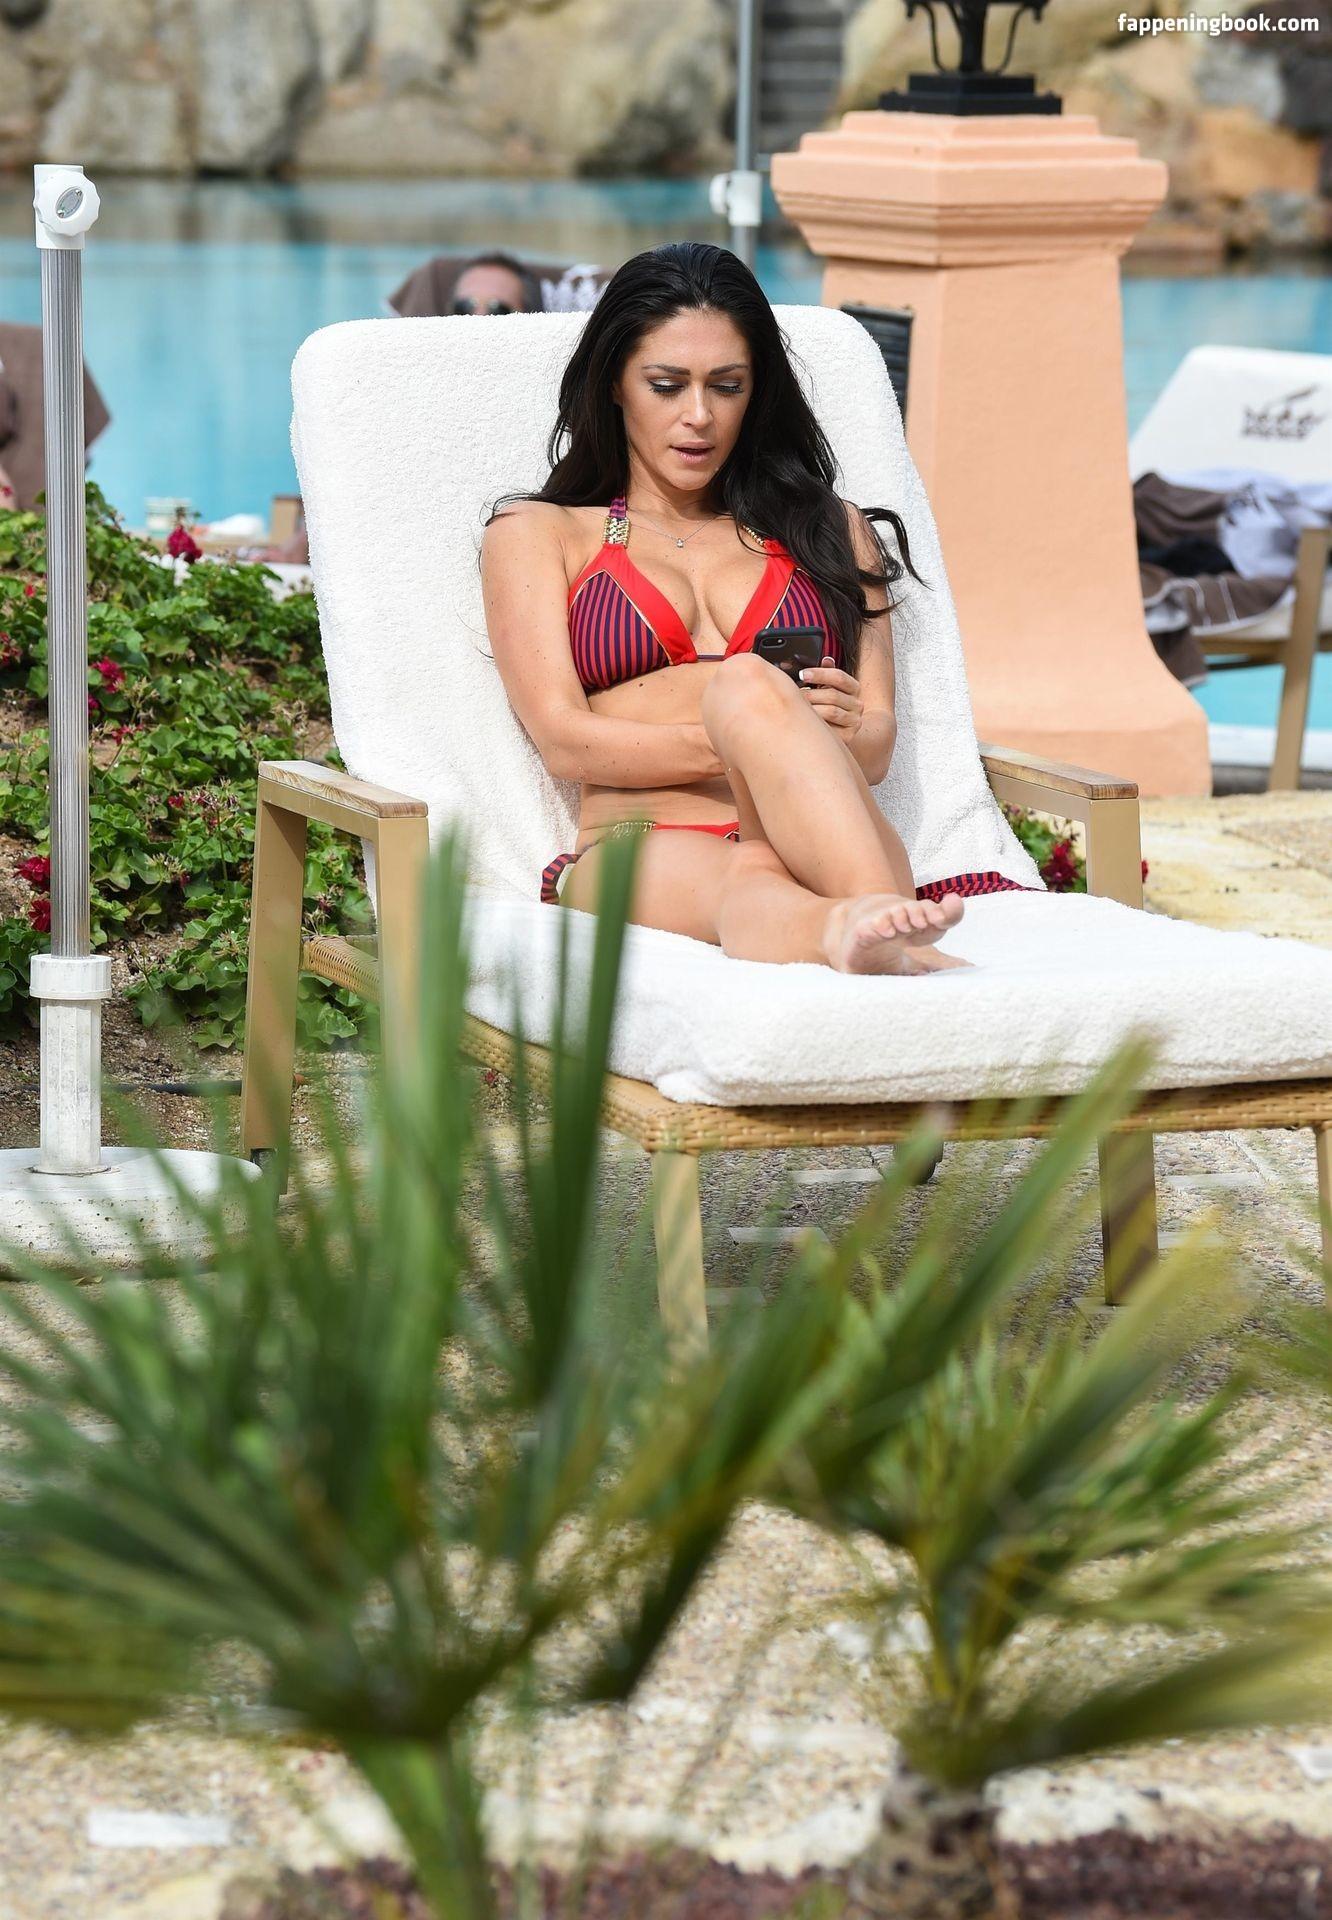 Nackt  Stephanie Meisenzahl 41 Sexiest